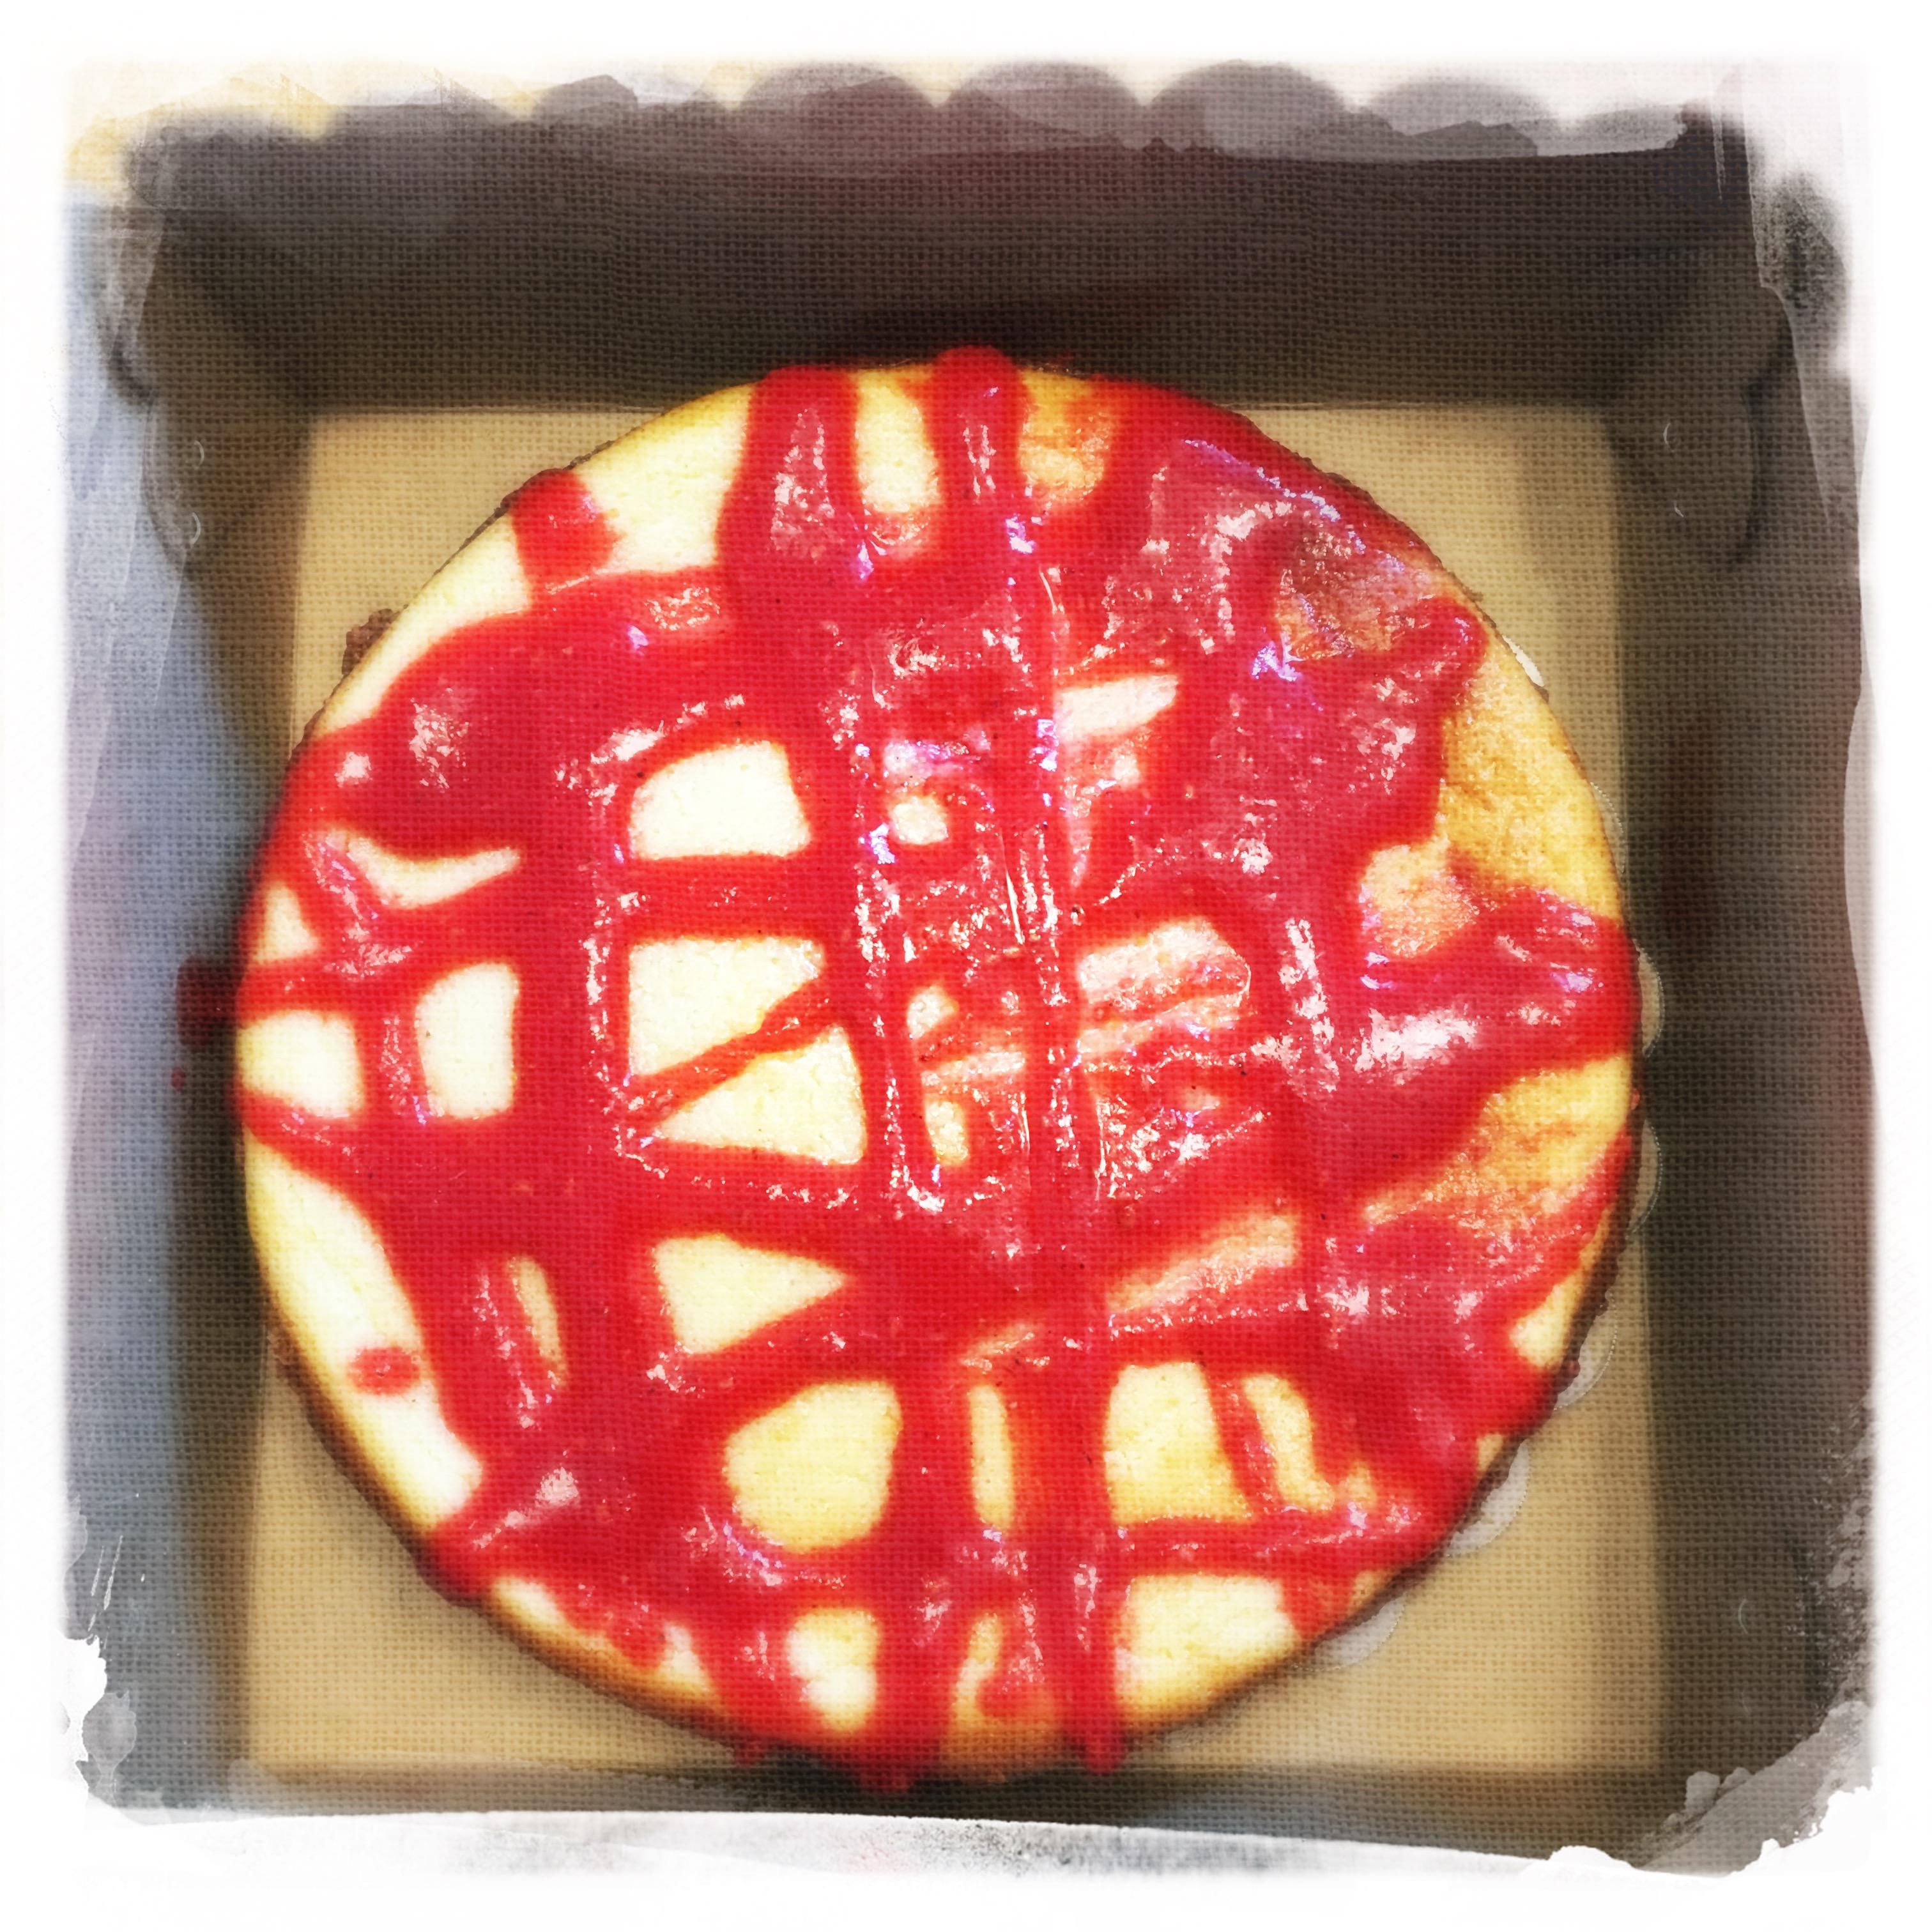 Cours Cheesecake Façon USA '16 III